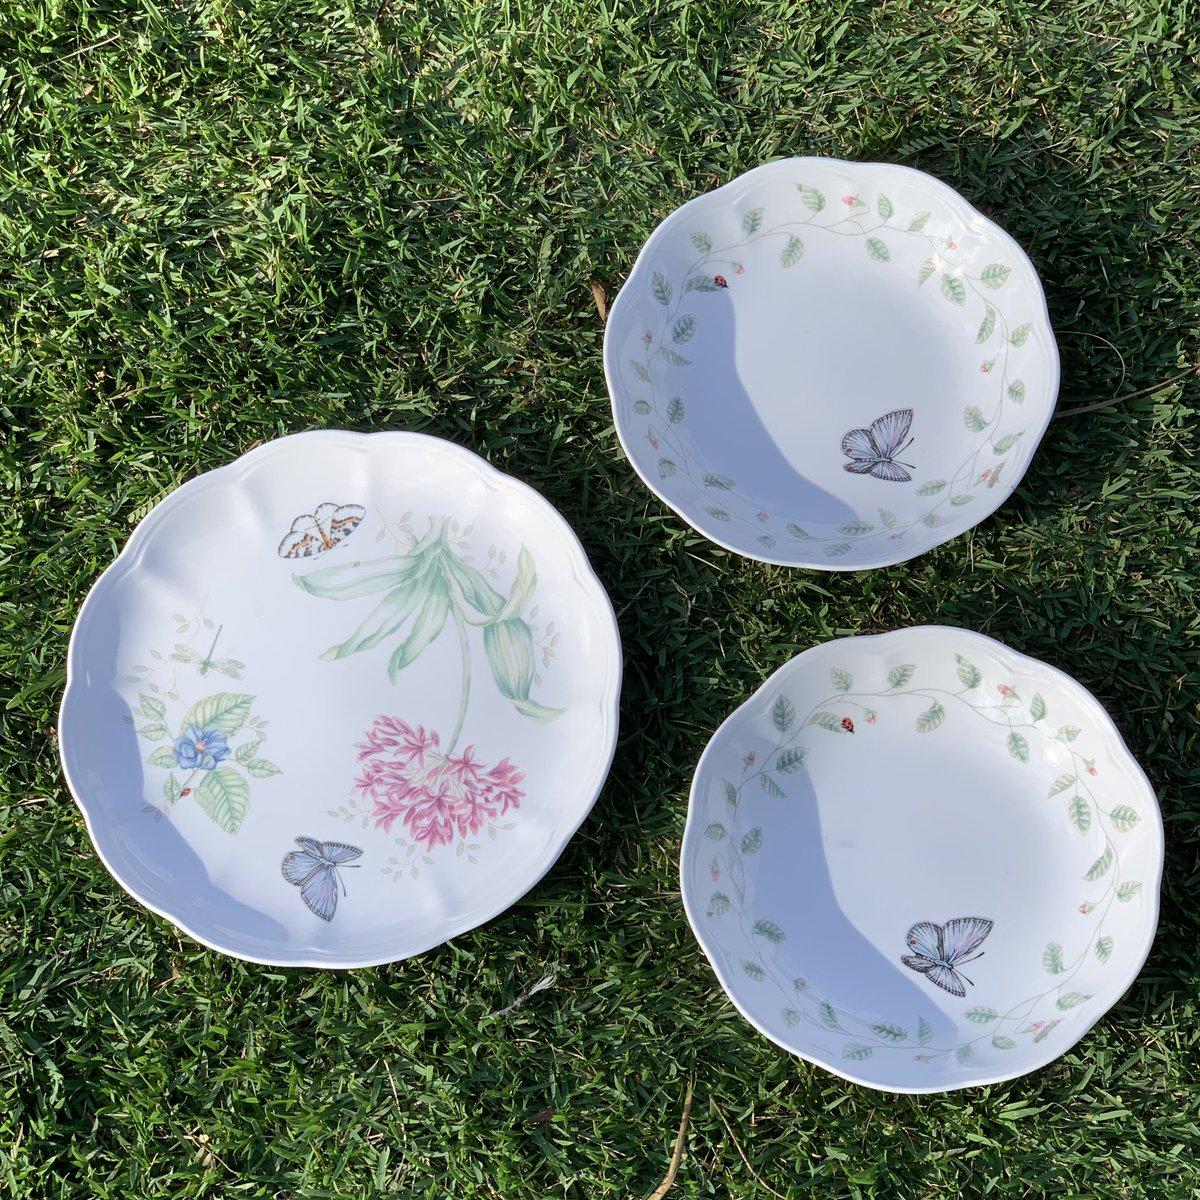 #lenox #butterflymeadow #pastabowl #dinnerplate #dinnerware #easterntailedblue https://rover.ebay.com/rover/0/0/0?mpre=https%3A%2F%2Fwww.ebay.com%2Fulk%2Fitm%2F283729140779…pic.twitter.com/rIfH0GNB6d